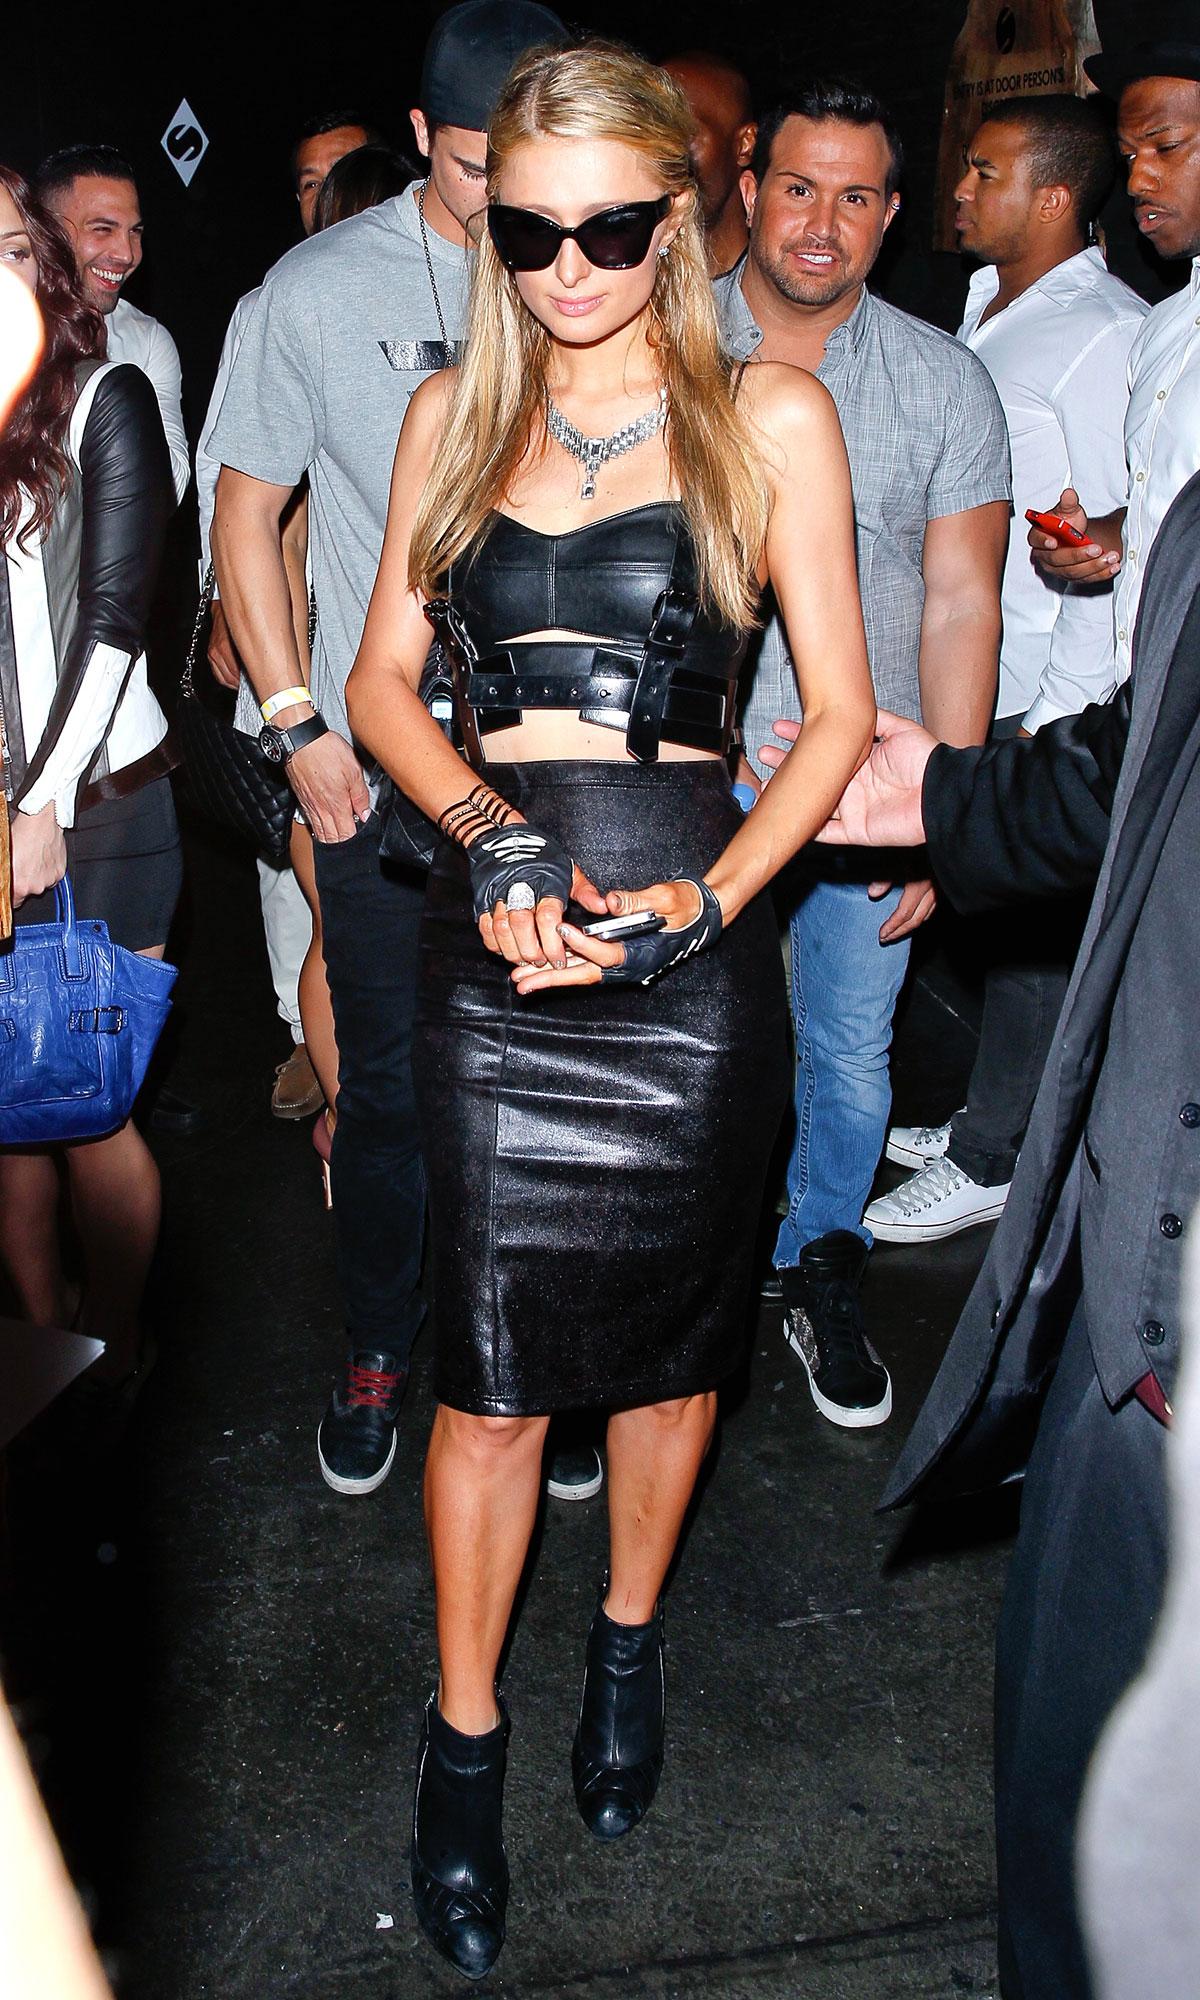 Paris Hilton at Sound Nightclub in LA